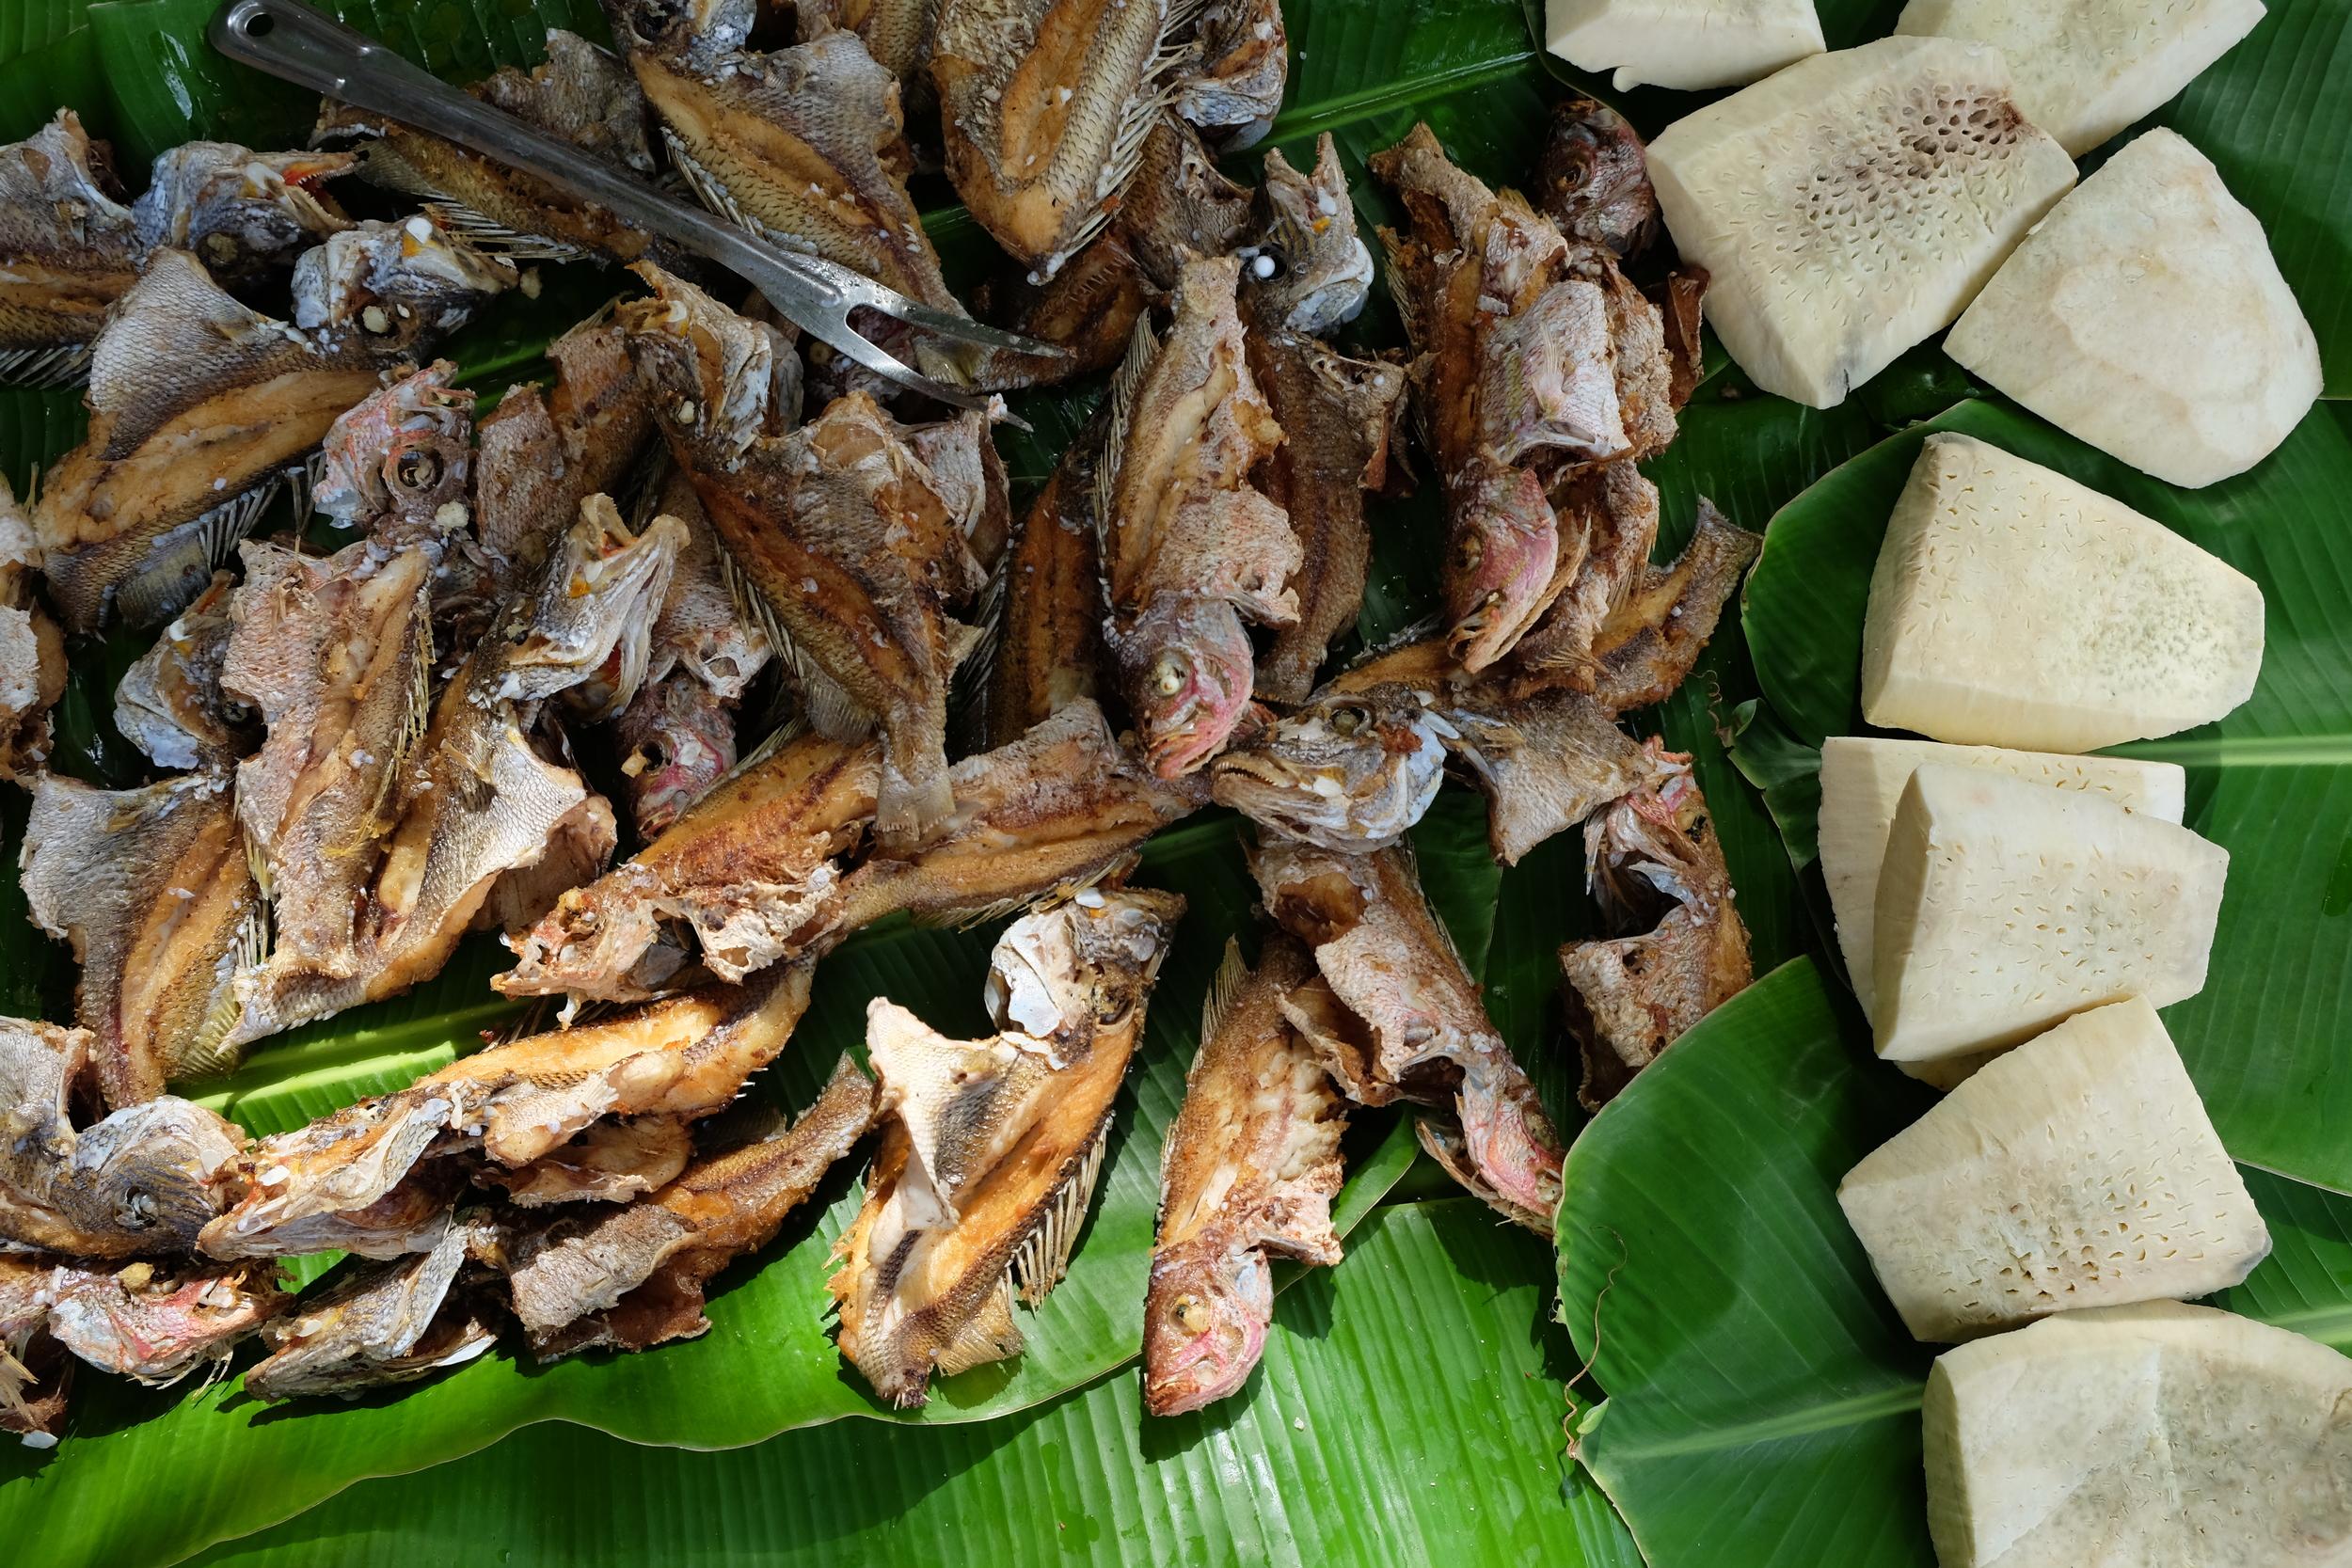 Breadfruit and fried fish prepared beachside on Little Corn Island, Nicaragua.